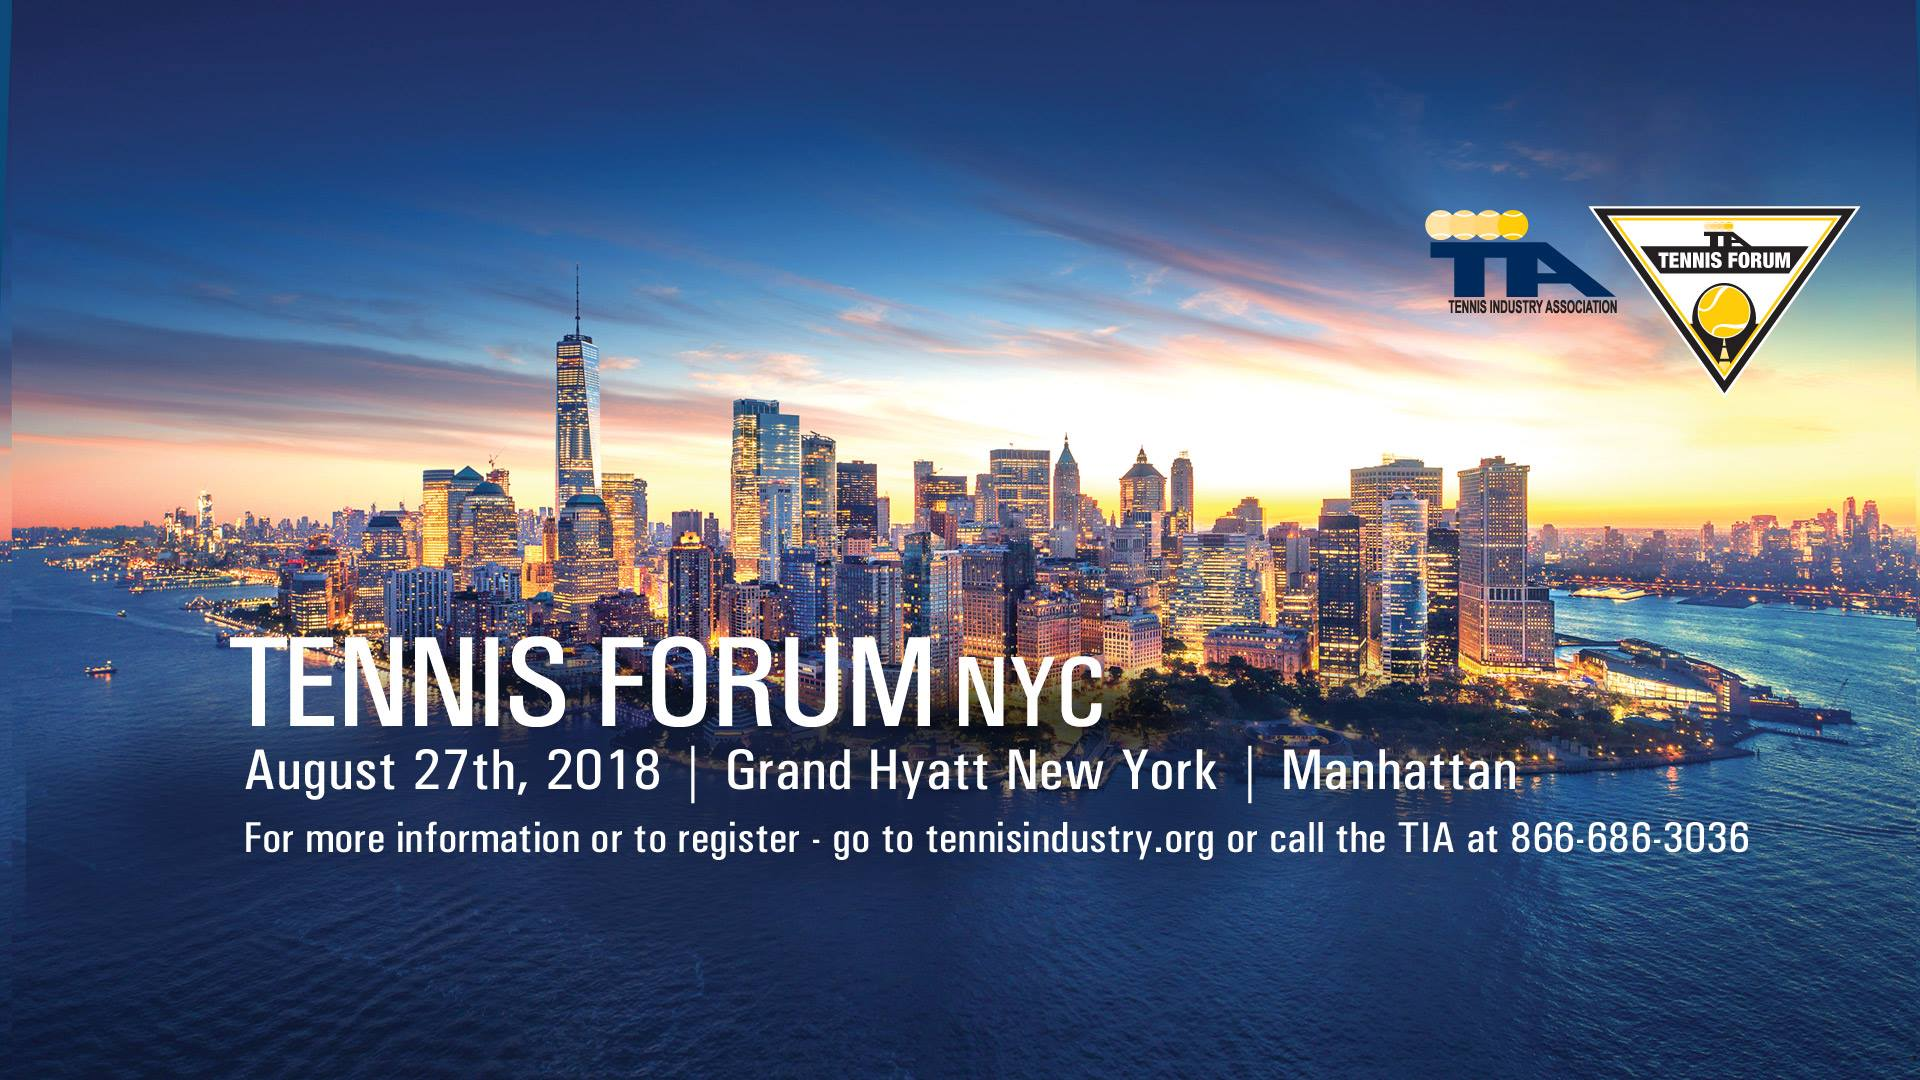 TIA Tennis Forum NYC